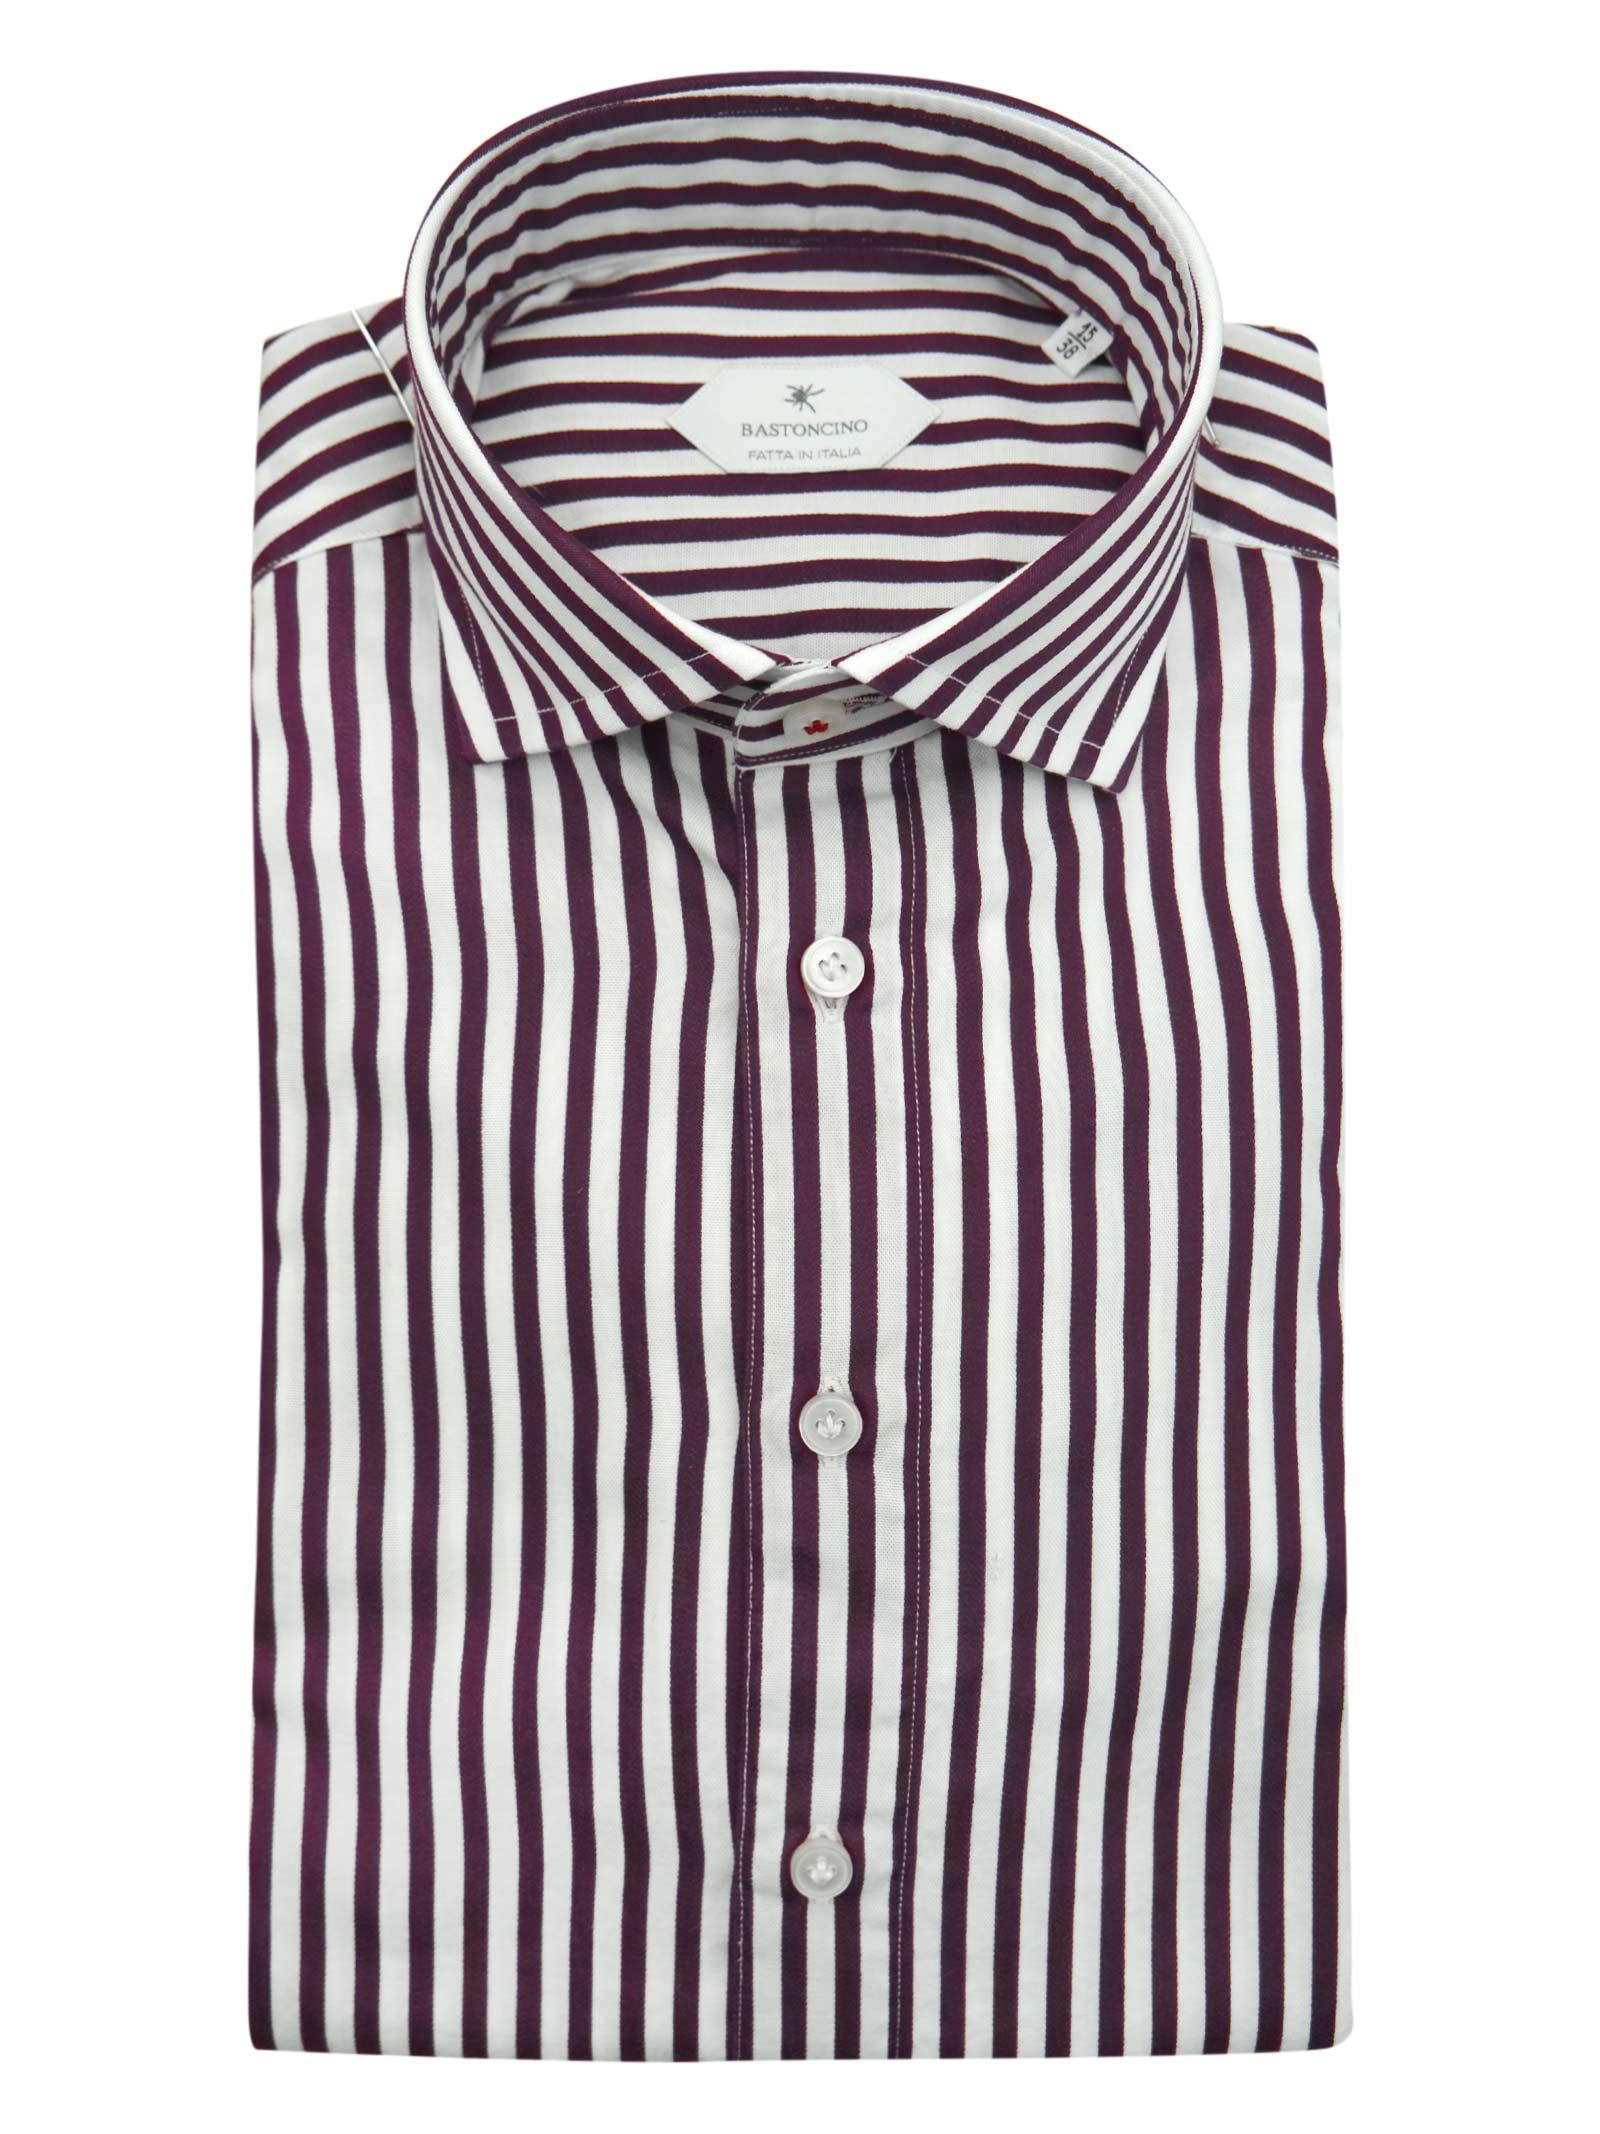 Camicia fantasia vestibilita regular BASTONCINO   Camicie   SARTB1996 03